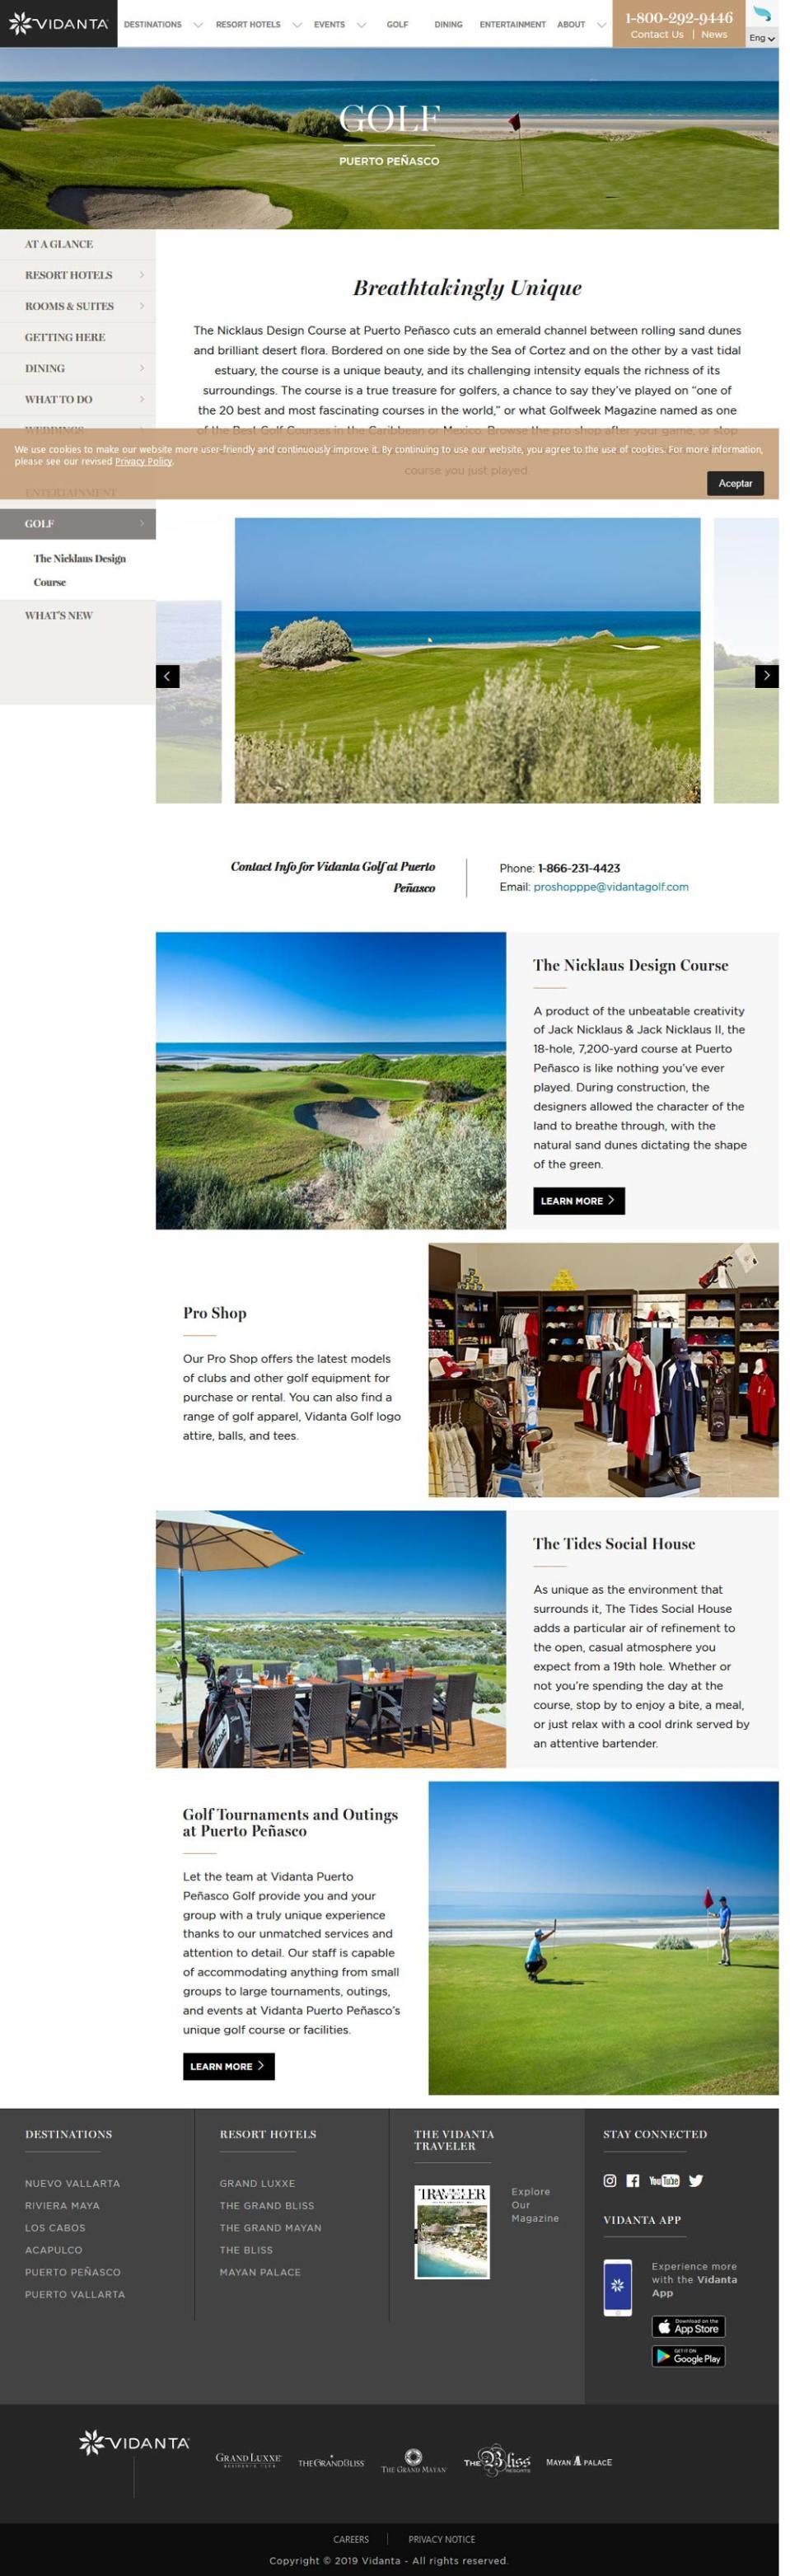 Vidanta Golf in Puerto Penasco (Rocky Point Mexico). Click here to visit Vidanta's Golf website.